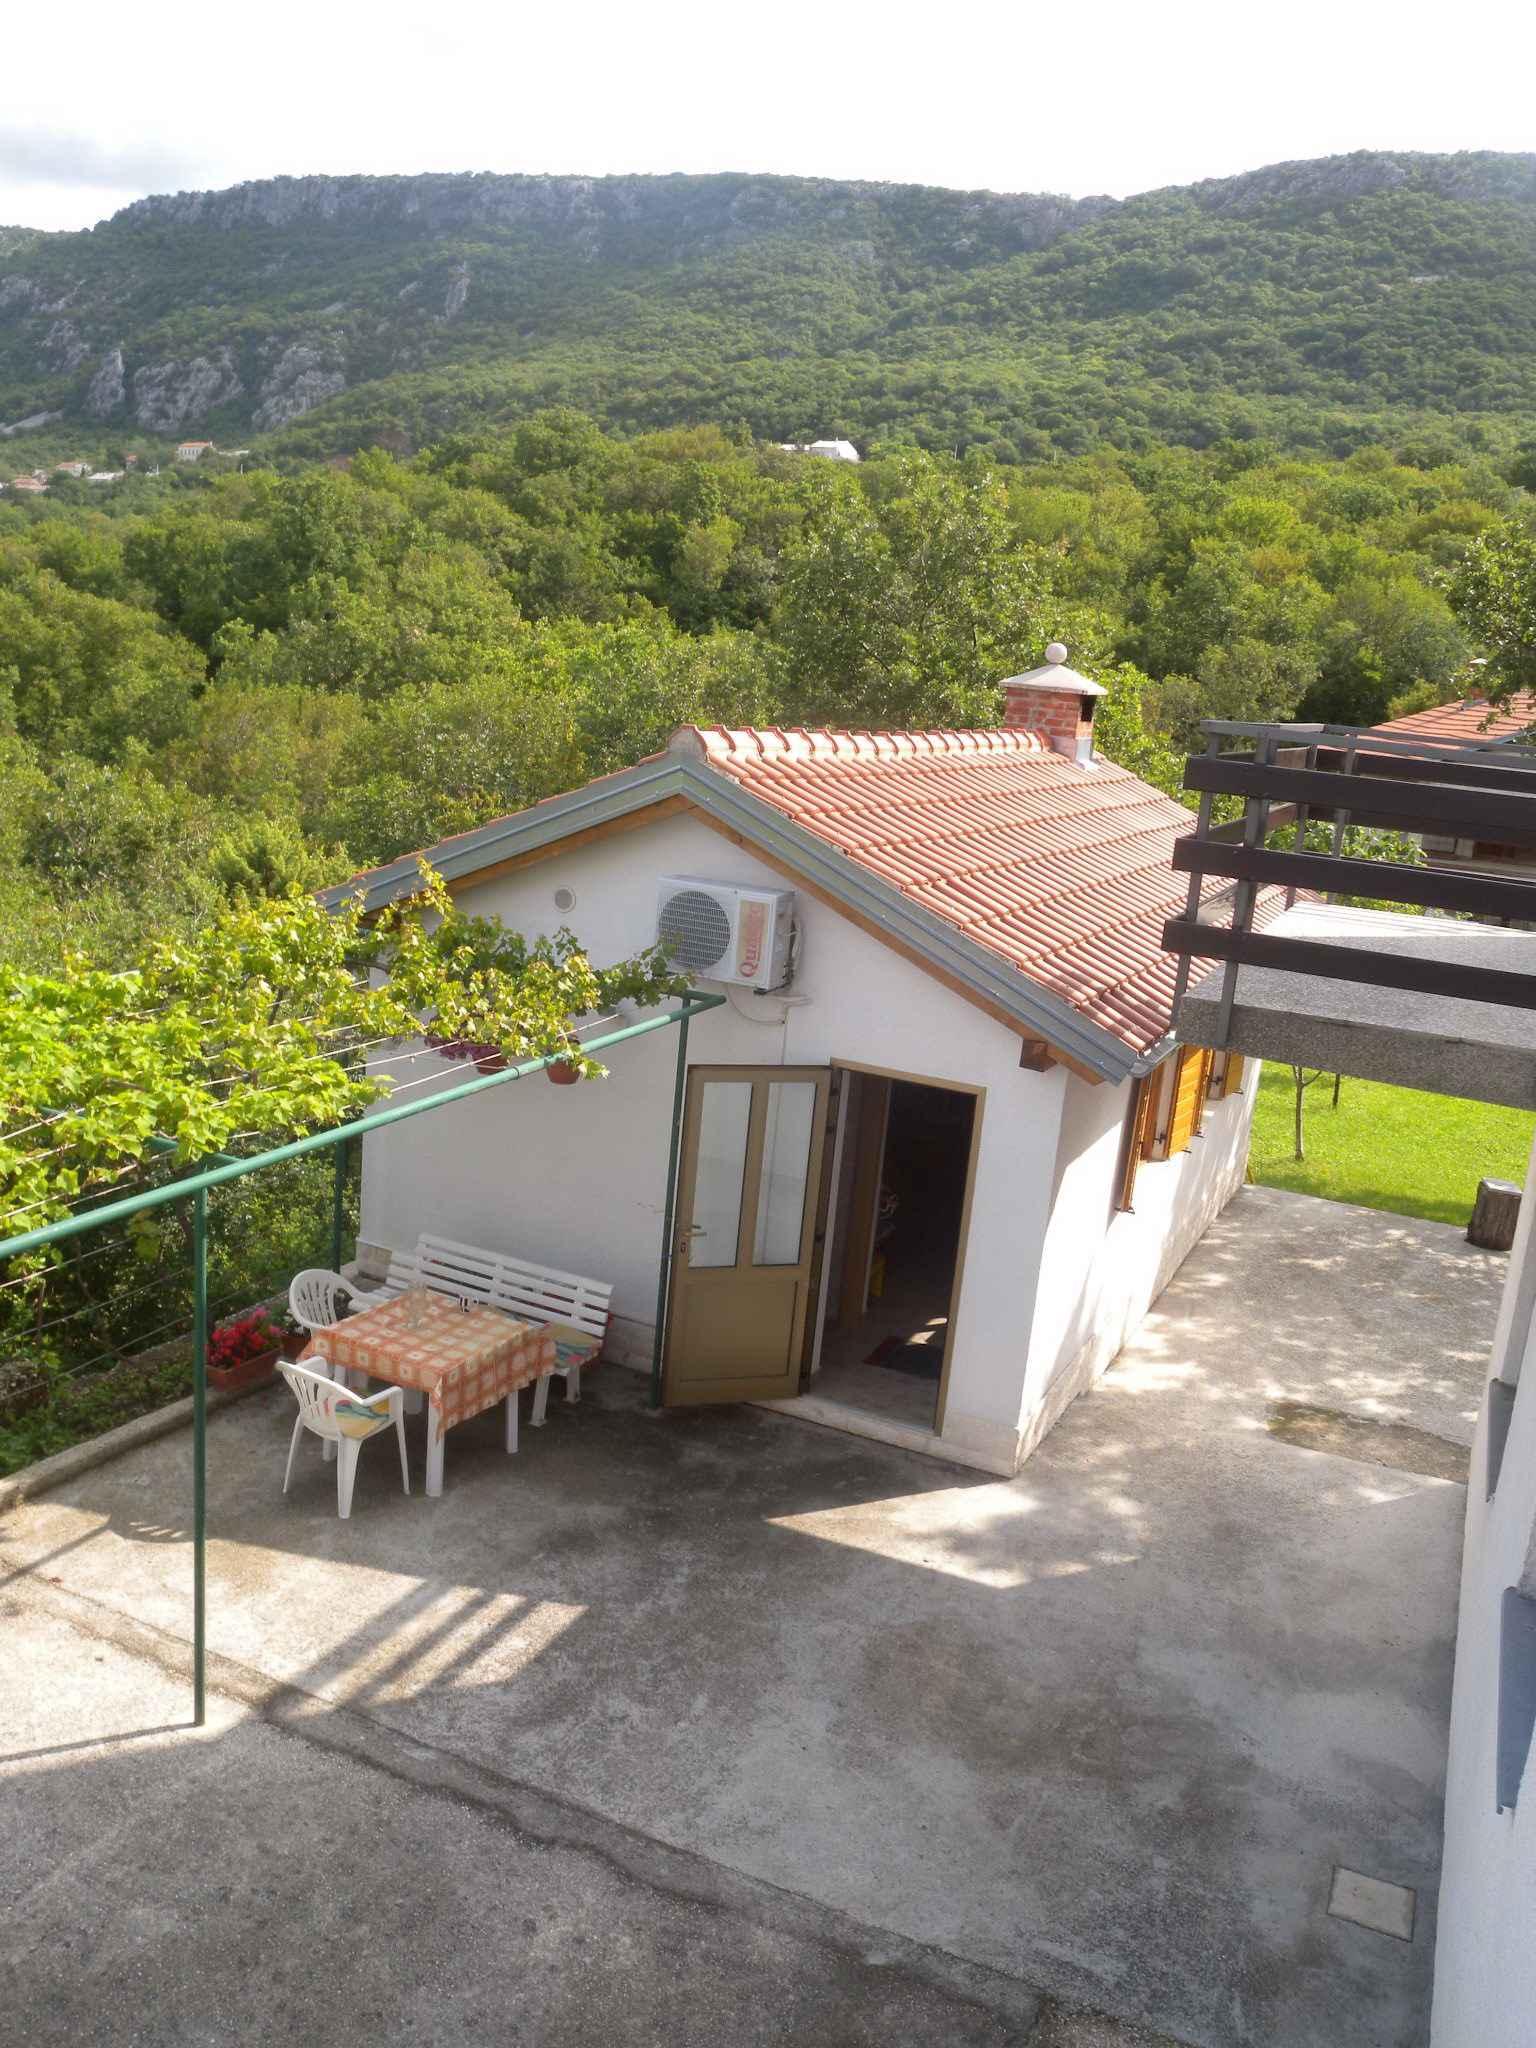 Appartement de vacances s ljetnom kuhinjom i bazenom (648047), Grižane, , Kvarner, Croatie, image 11